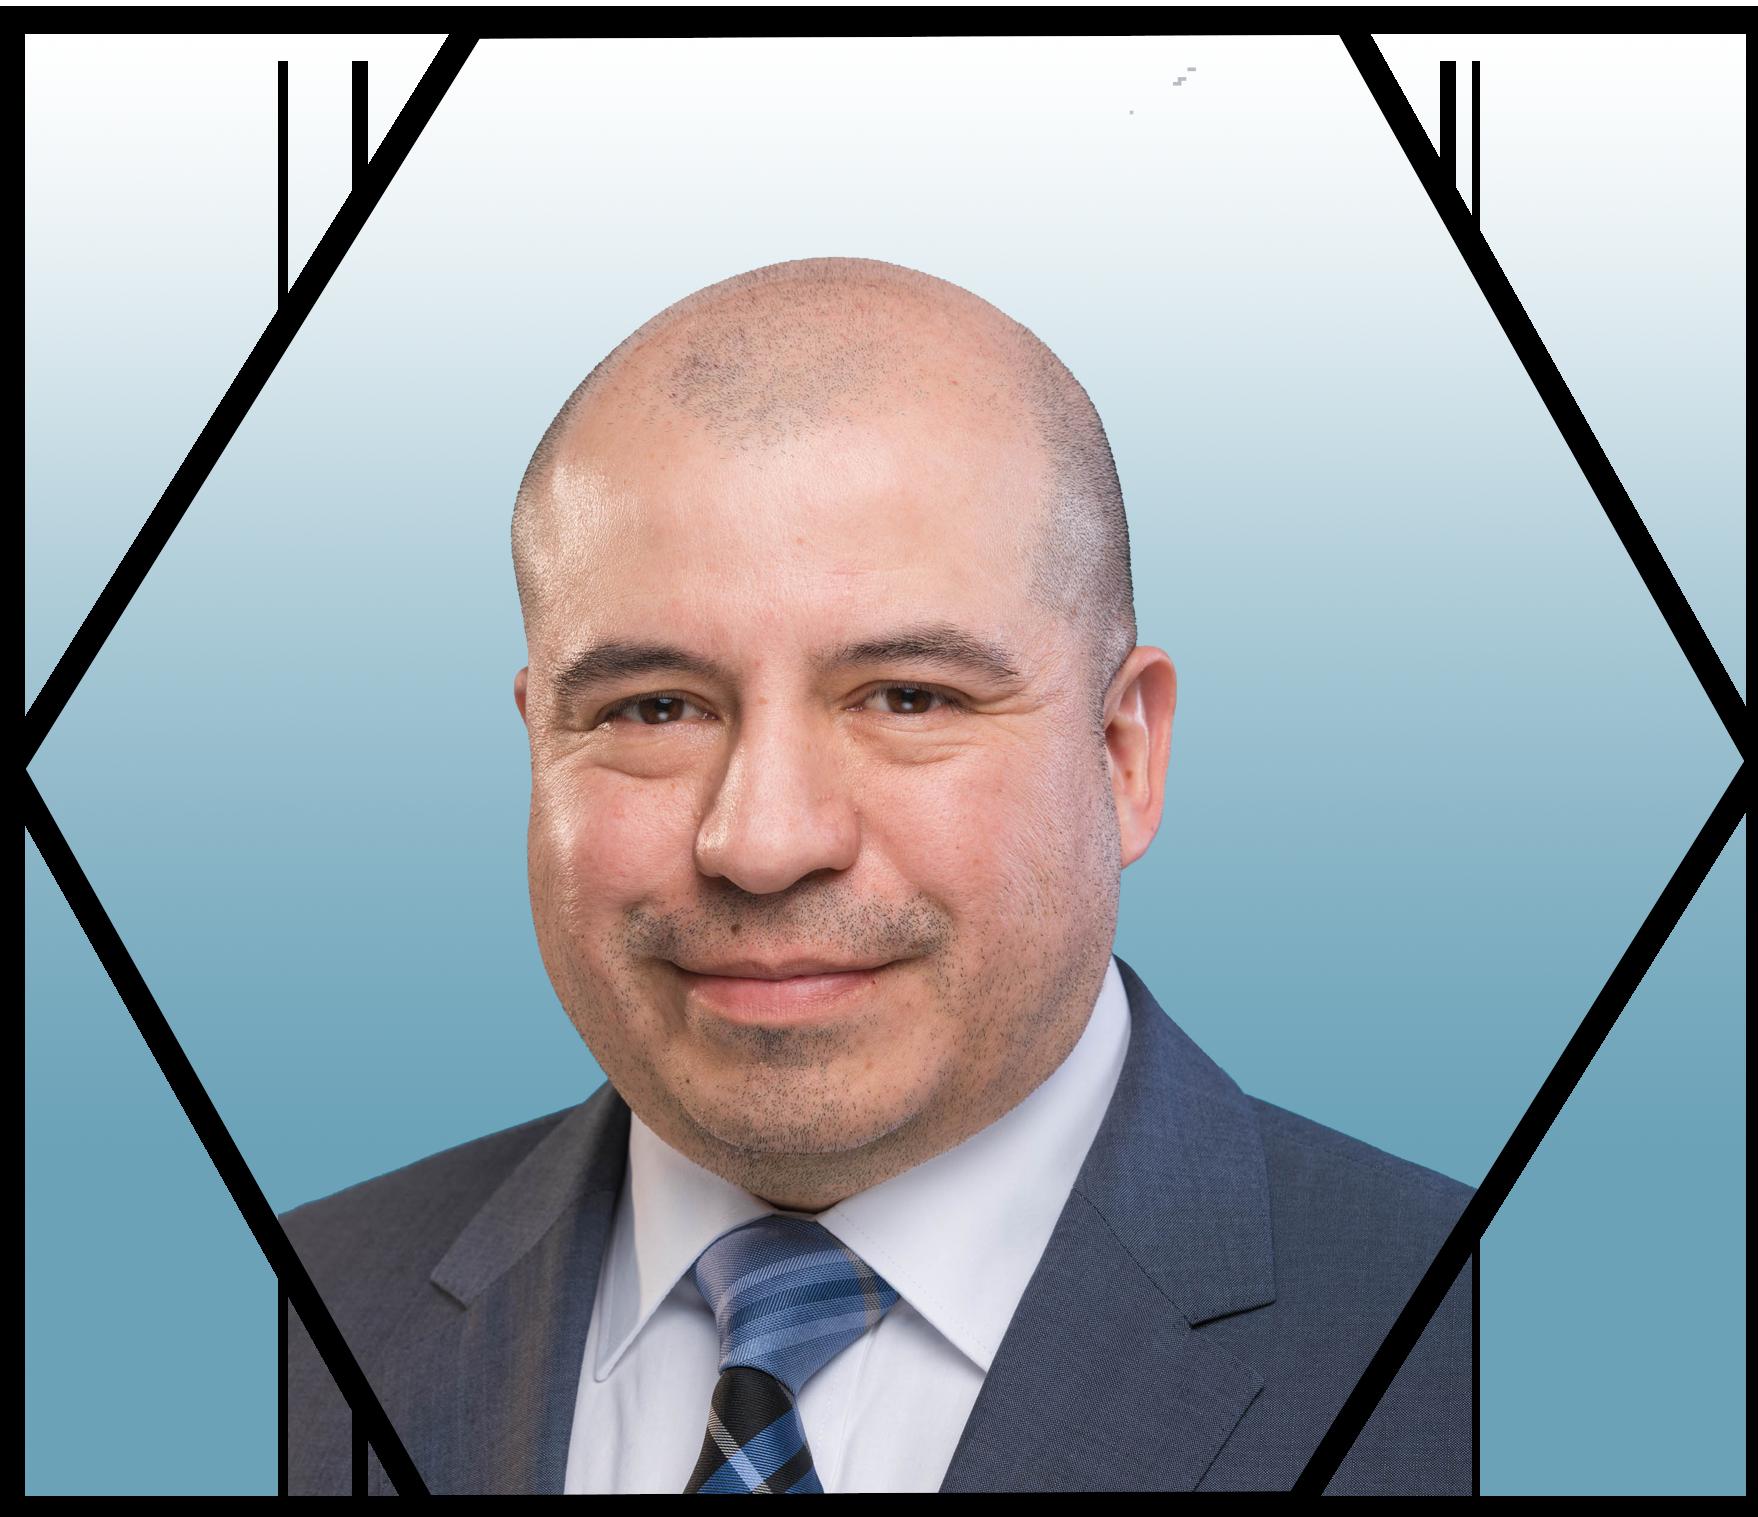 Ruben%20Bonilla-Guerrero,%20MD,%20FACMG,%20FAACC,%20Medical%20Director Leadership Team